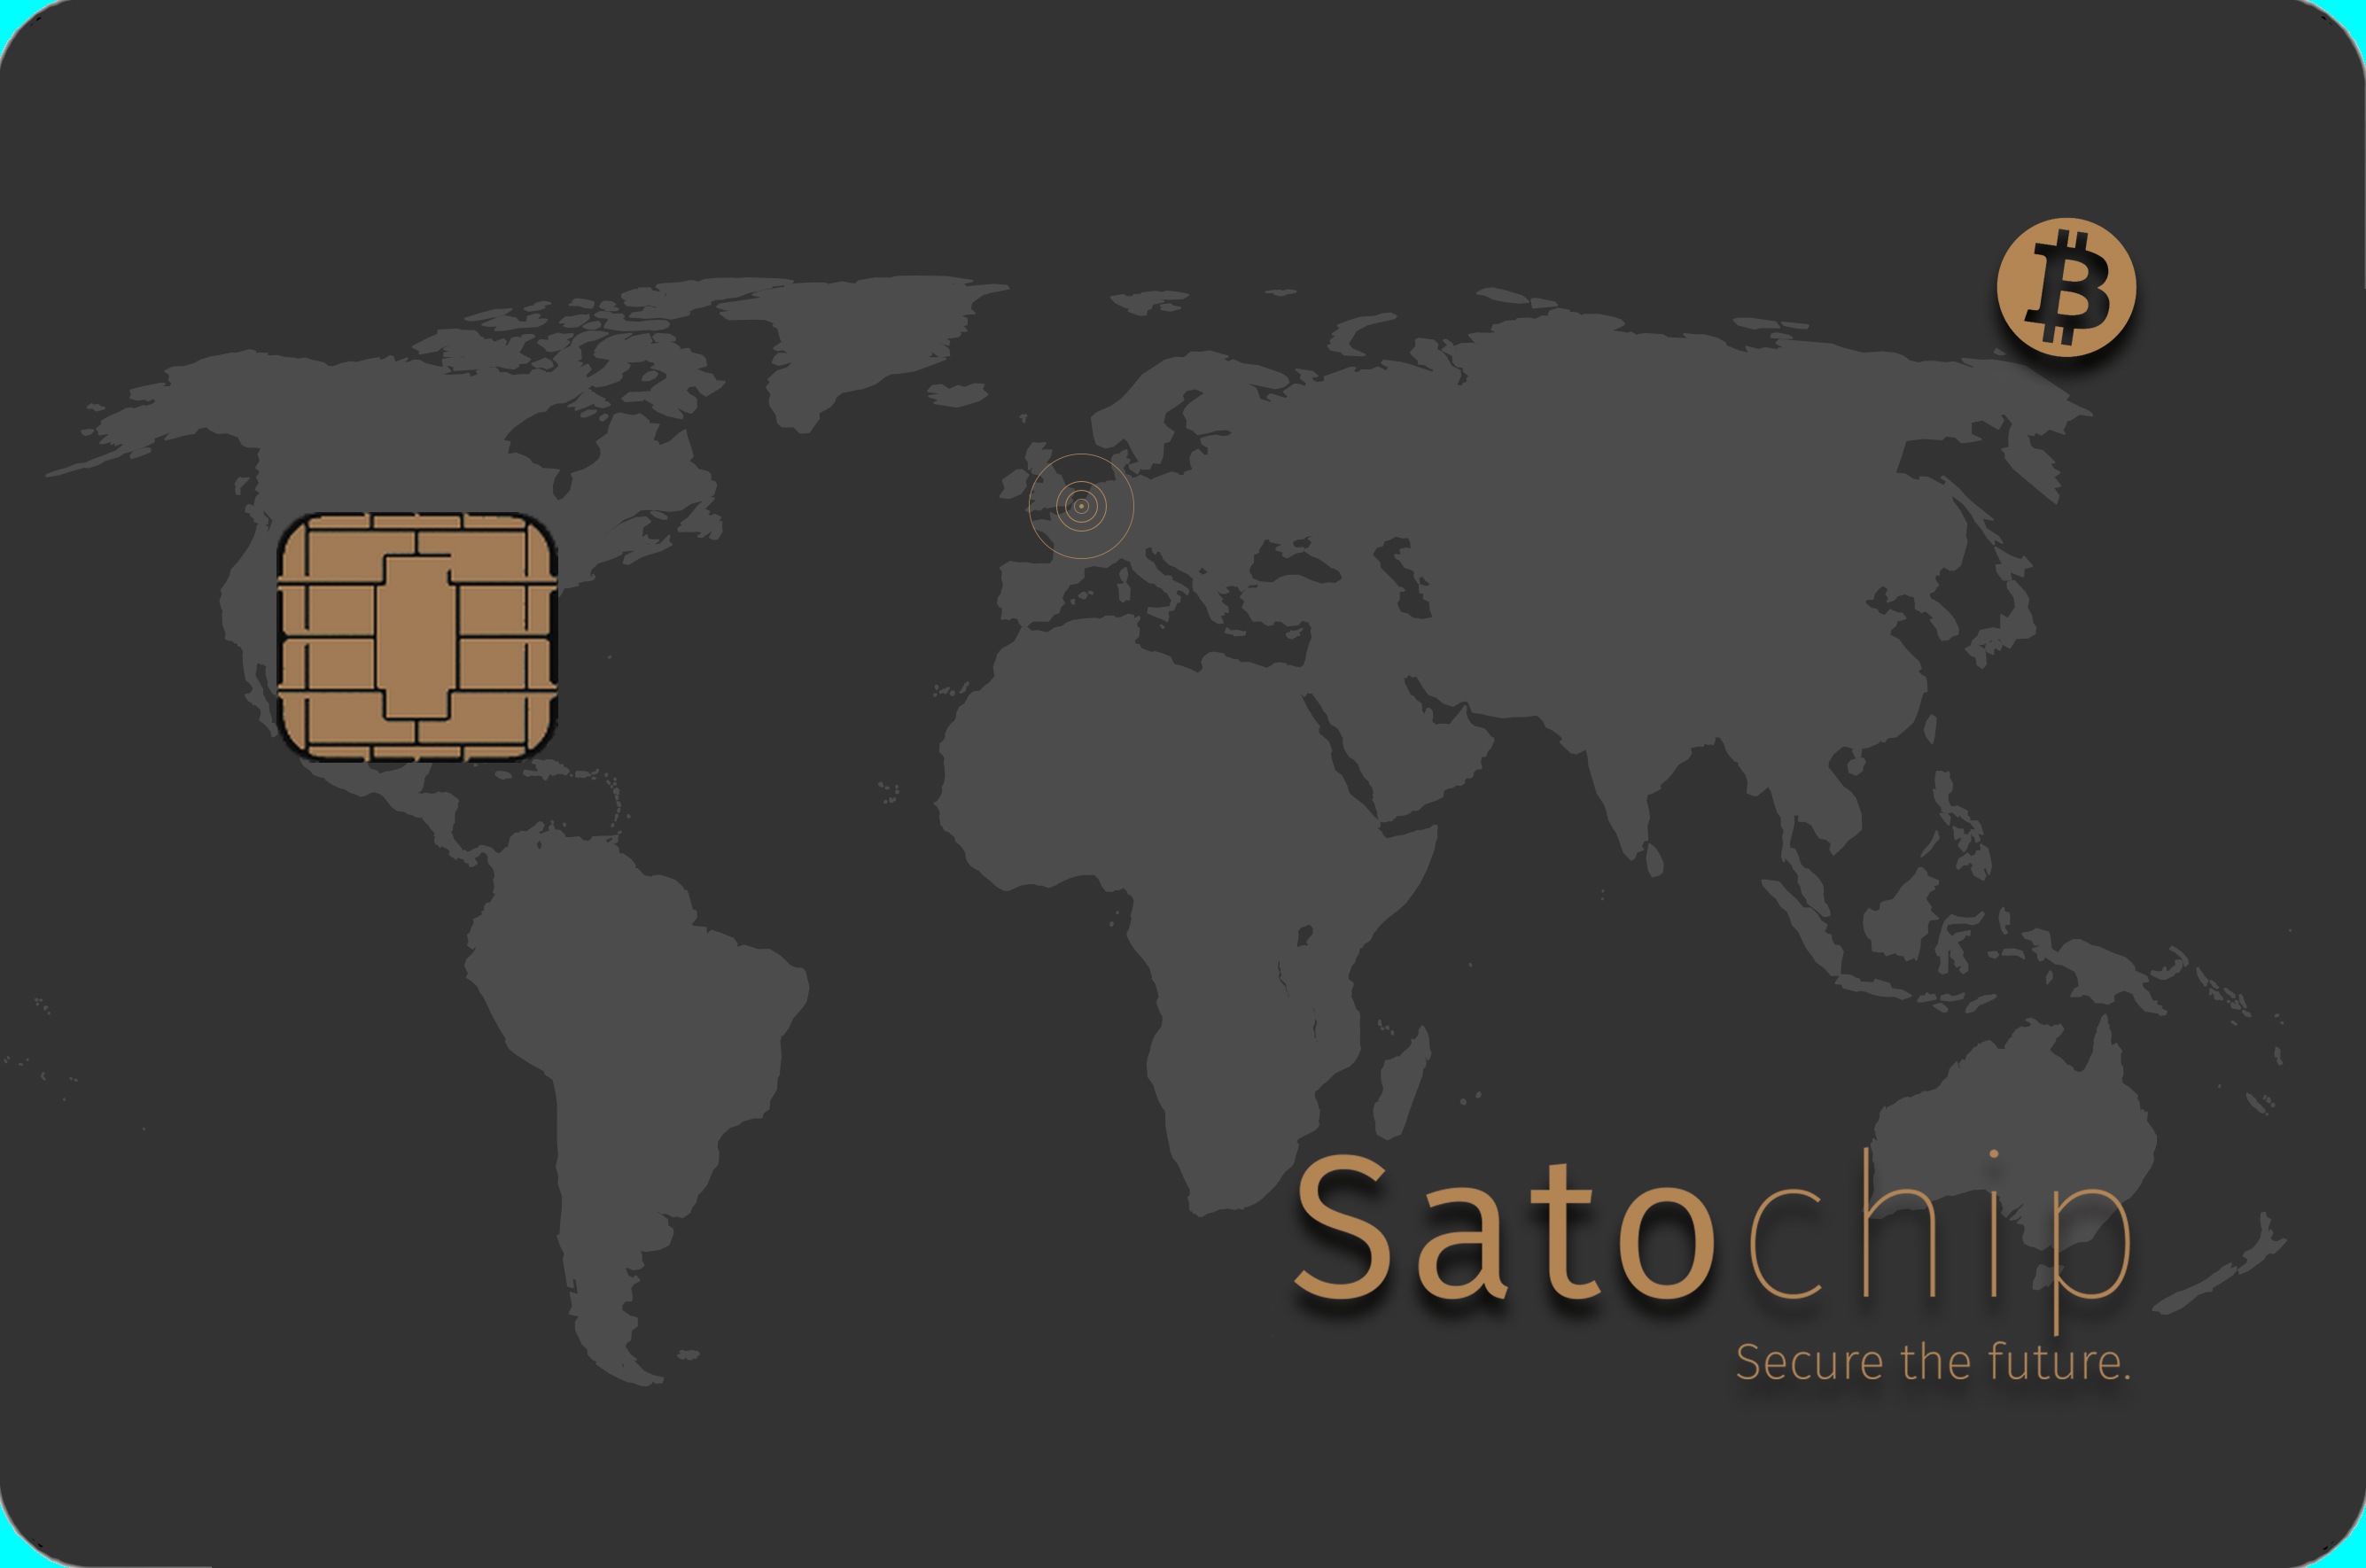 Satochip - Bitcoin hardware wallet